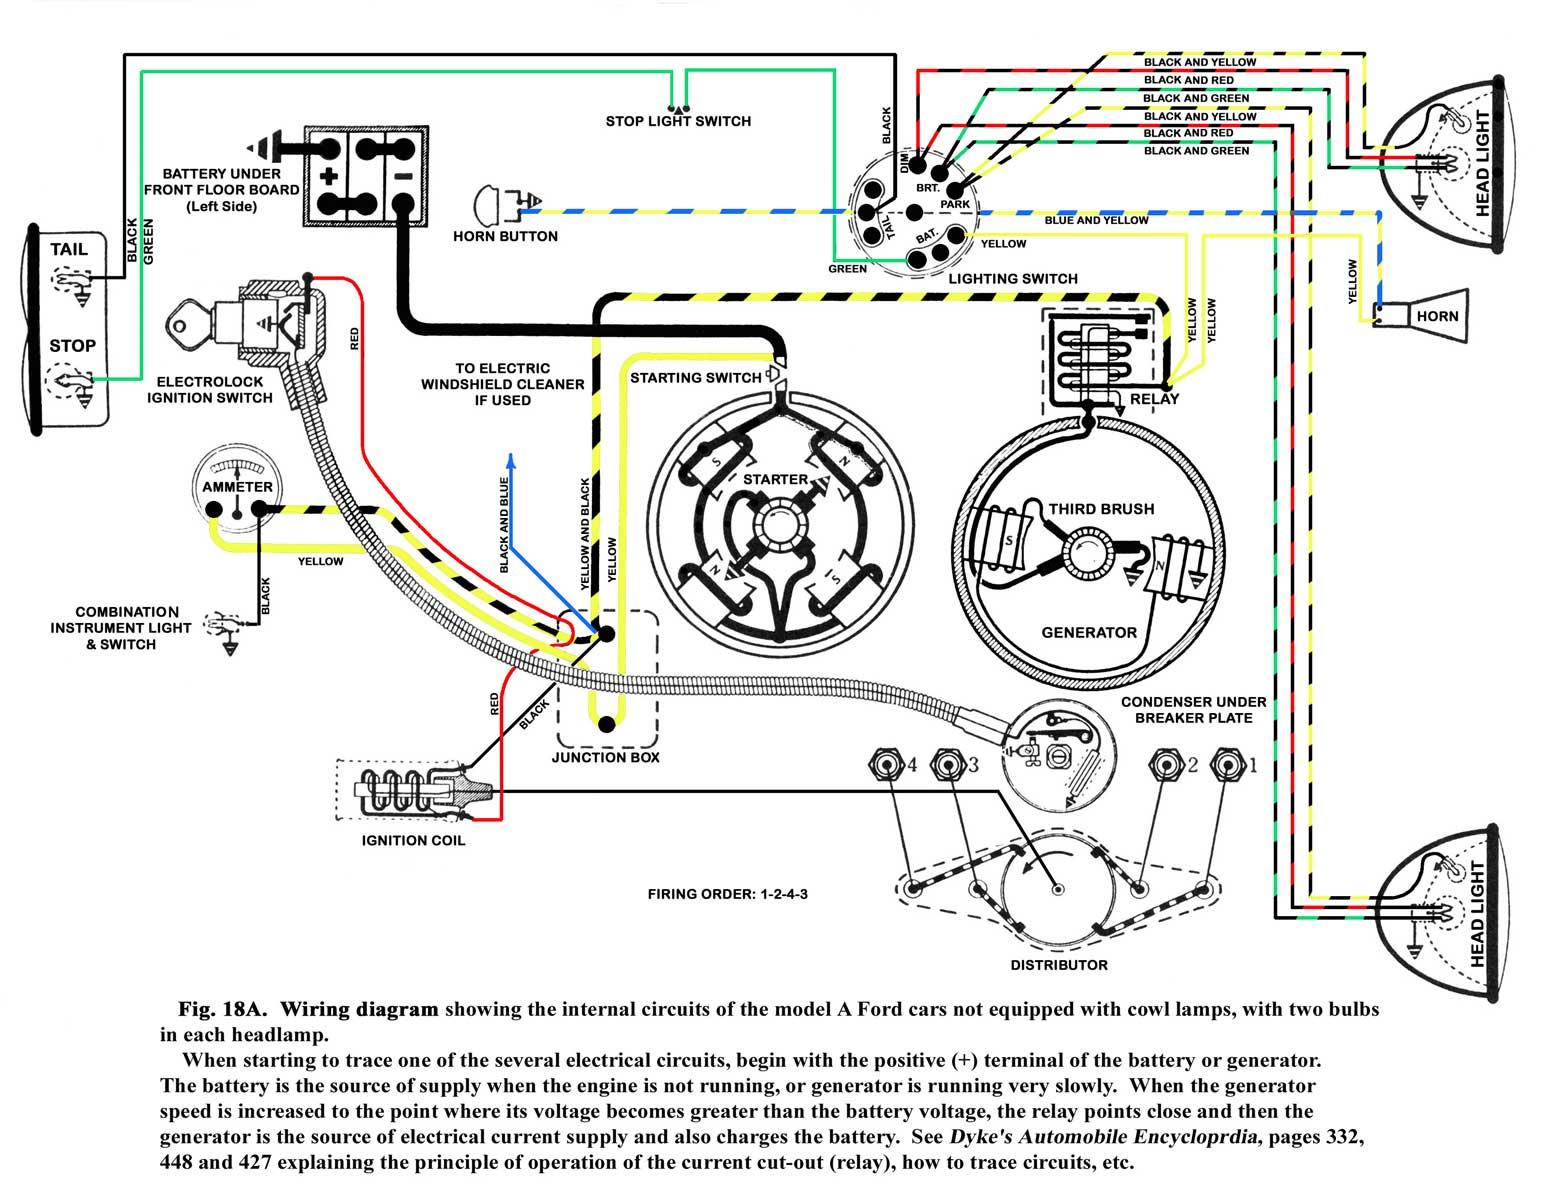 12 volt generator wiring diagram wwwallischalmerscom forum ford tractor ignition switch wiring http wwwpic2flycom ford [ 1546 x 1195 Pixel ]